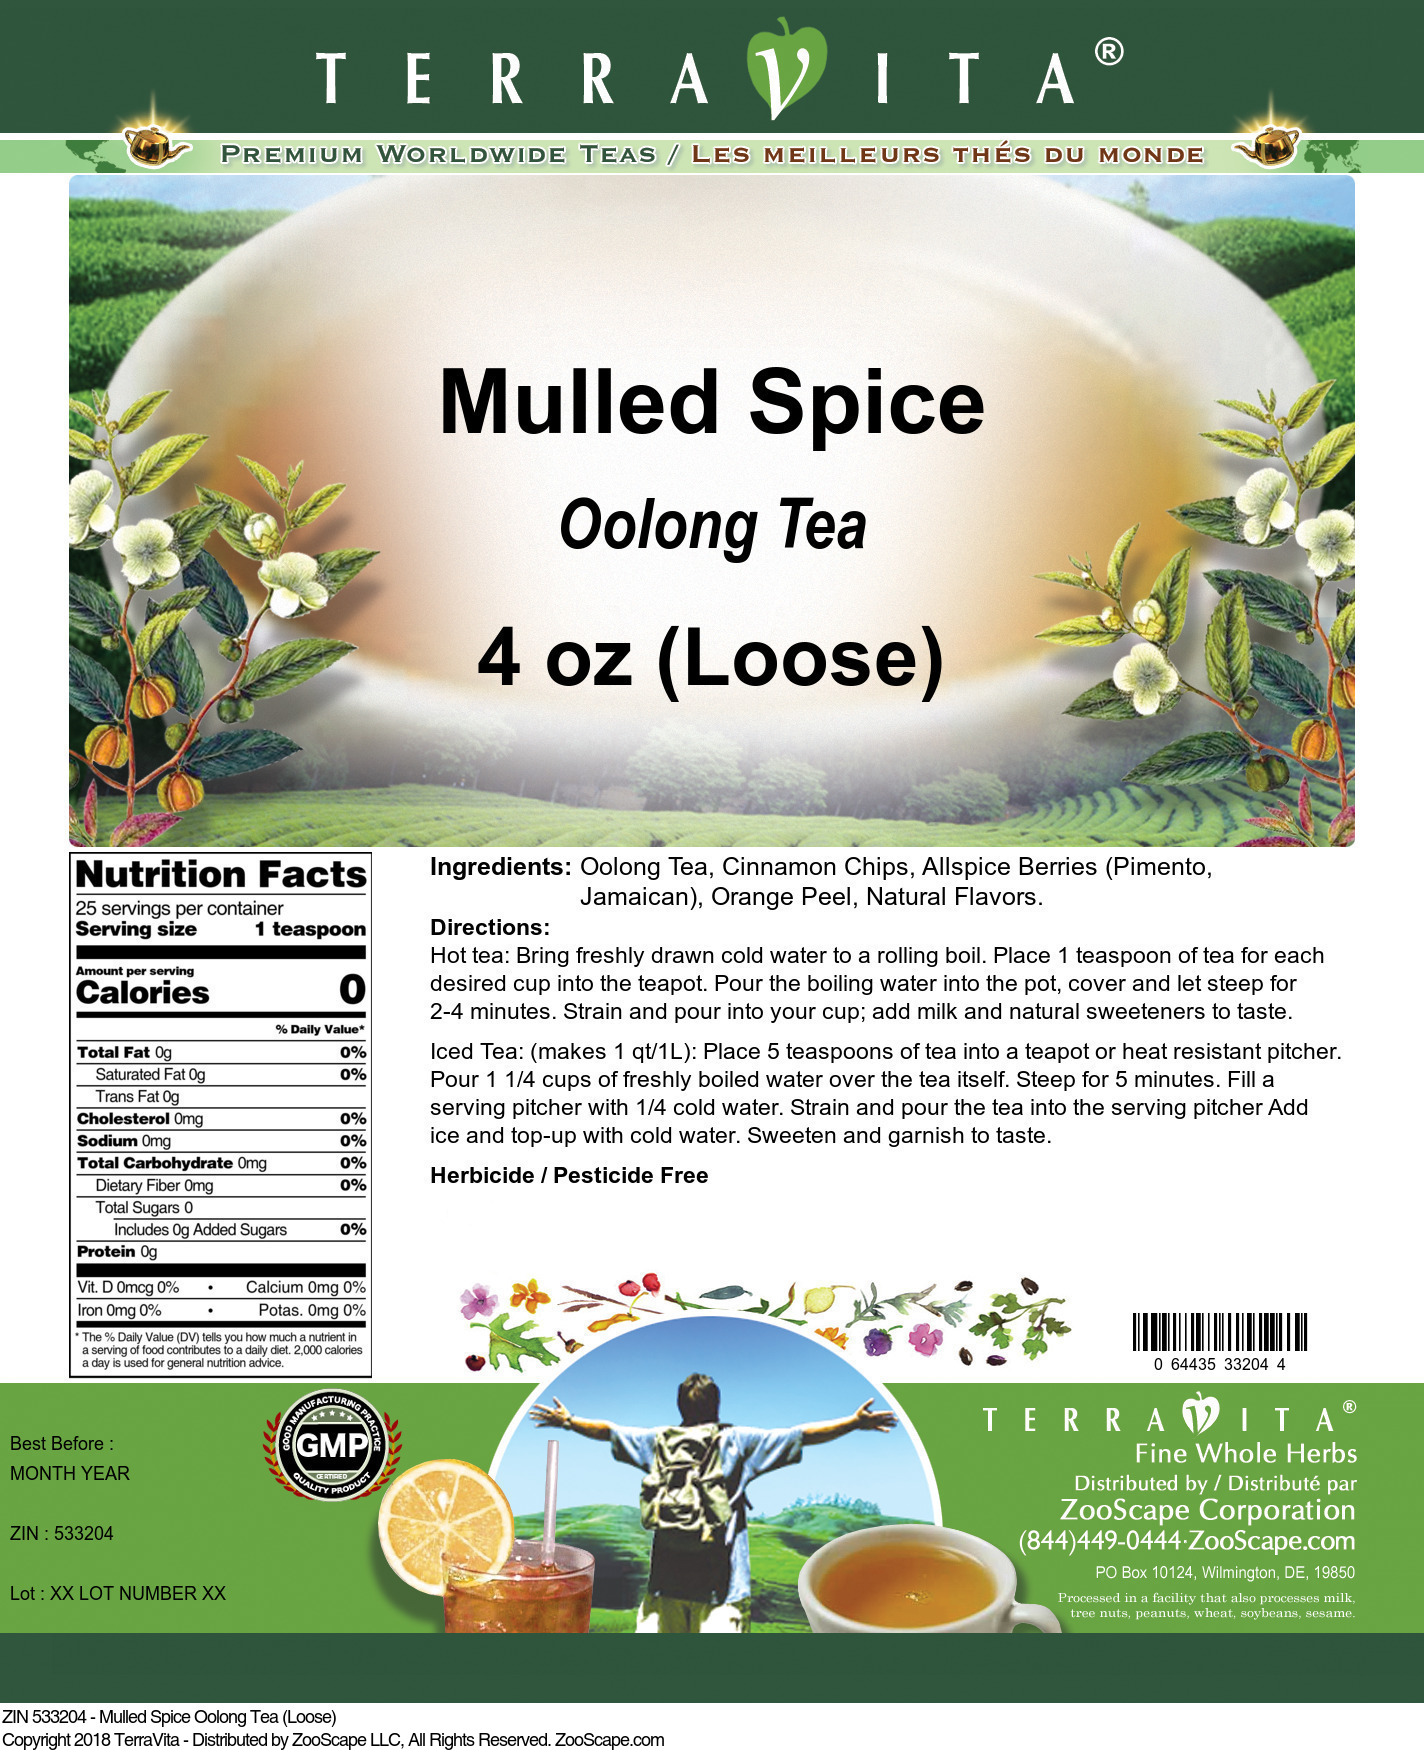 Mulled Spice Oolong Tea (Loose)